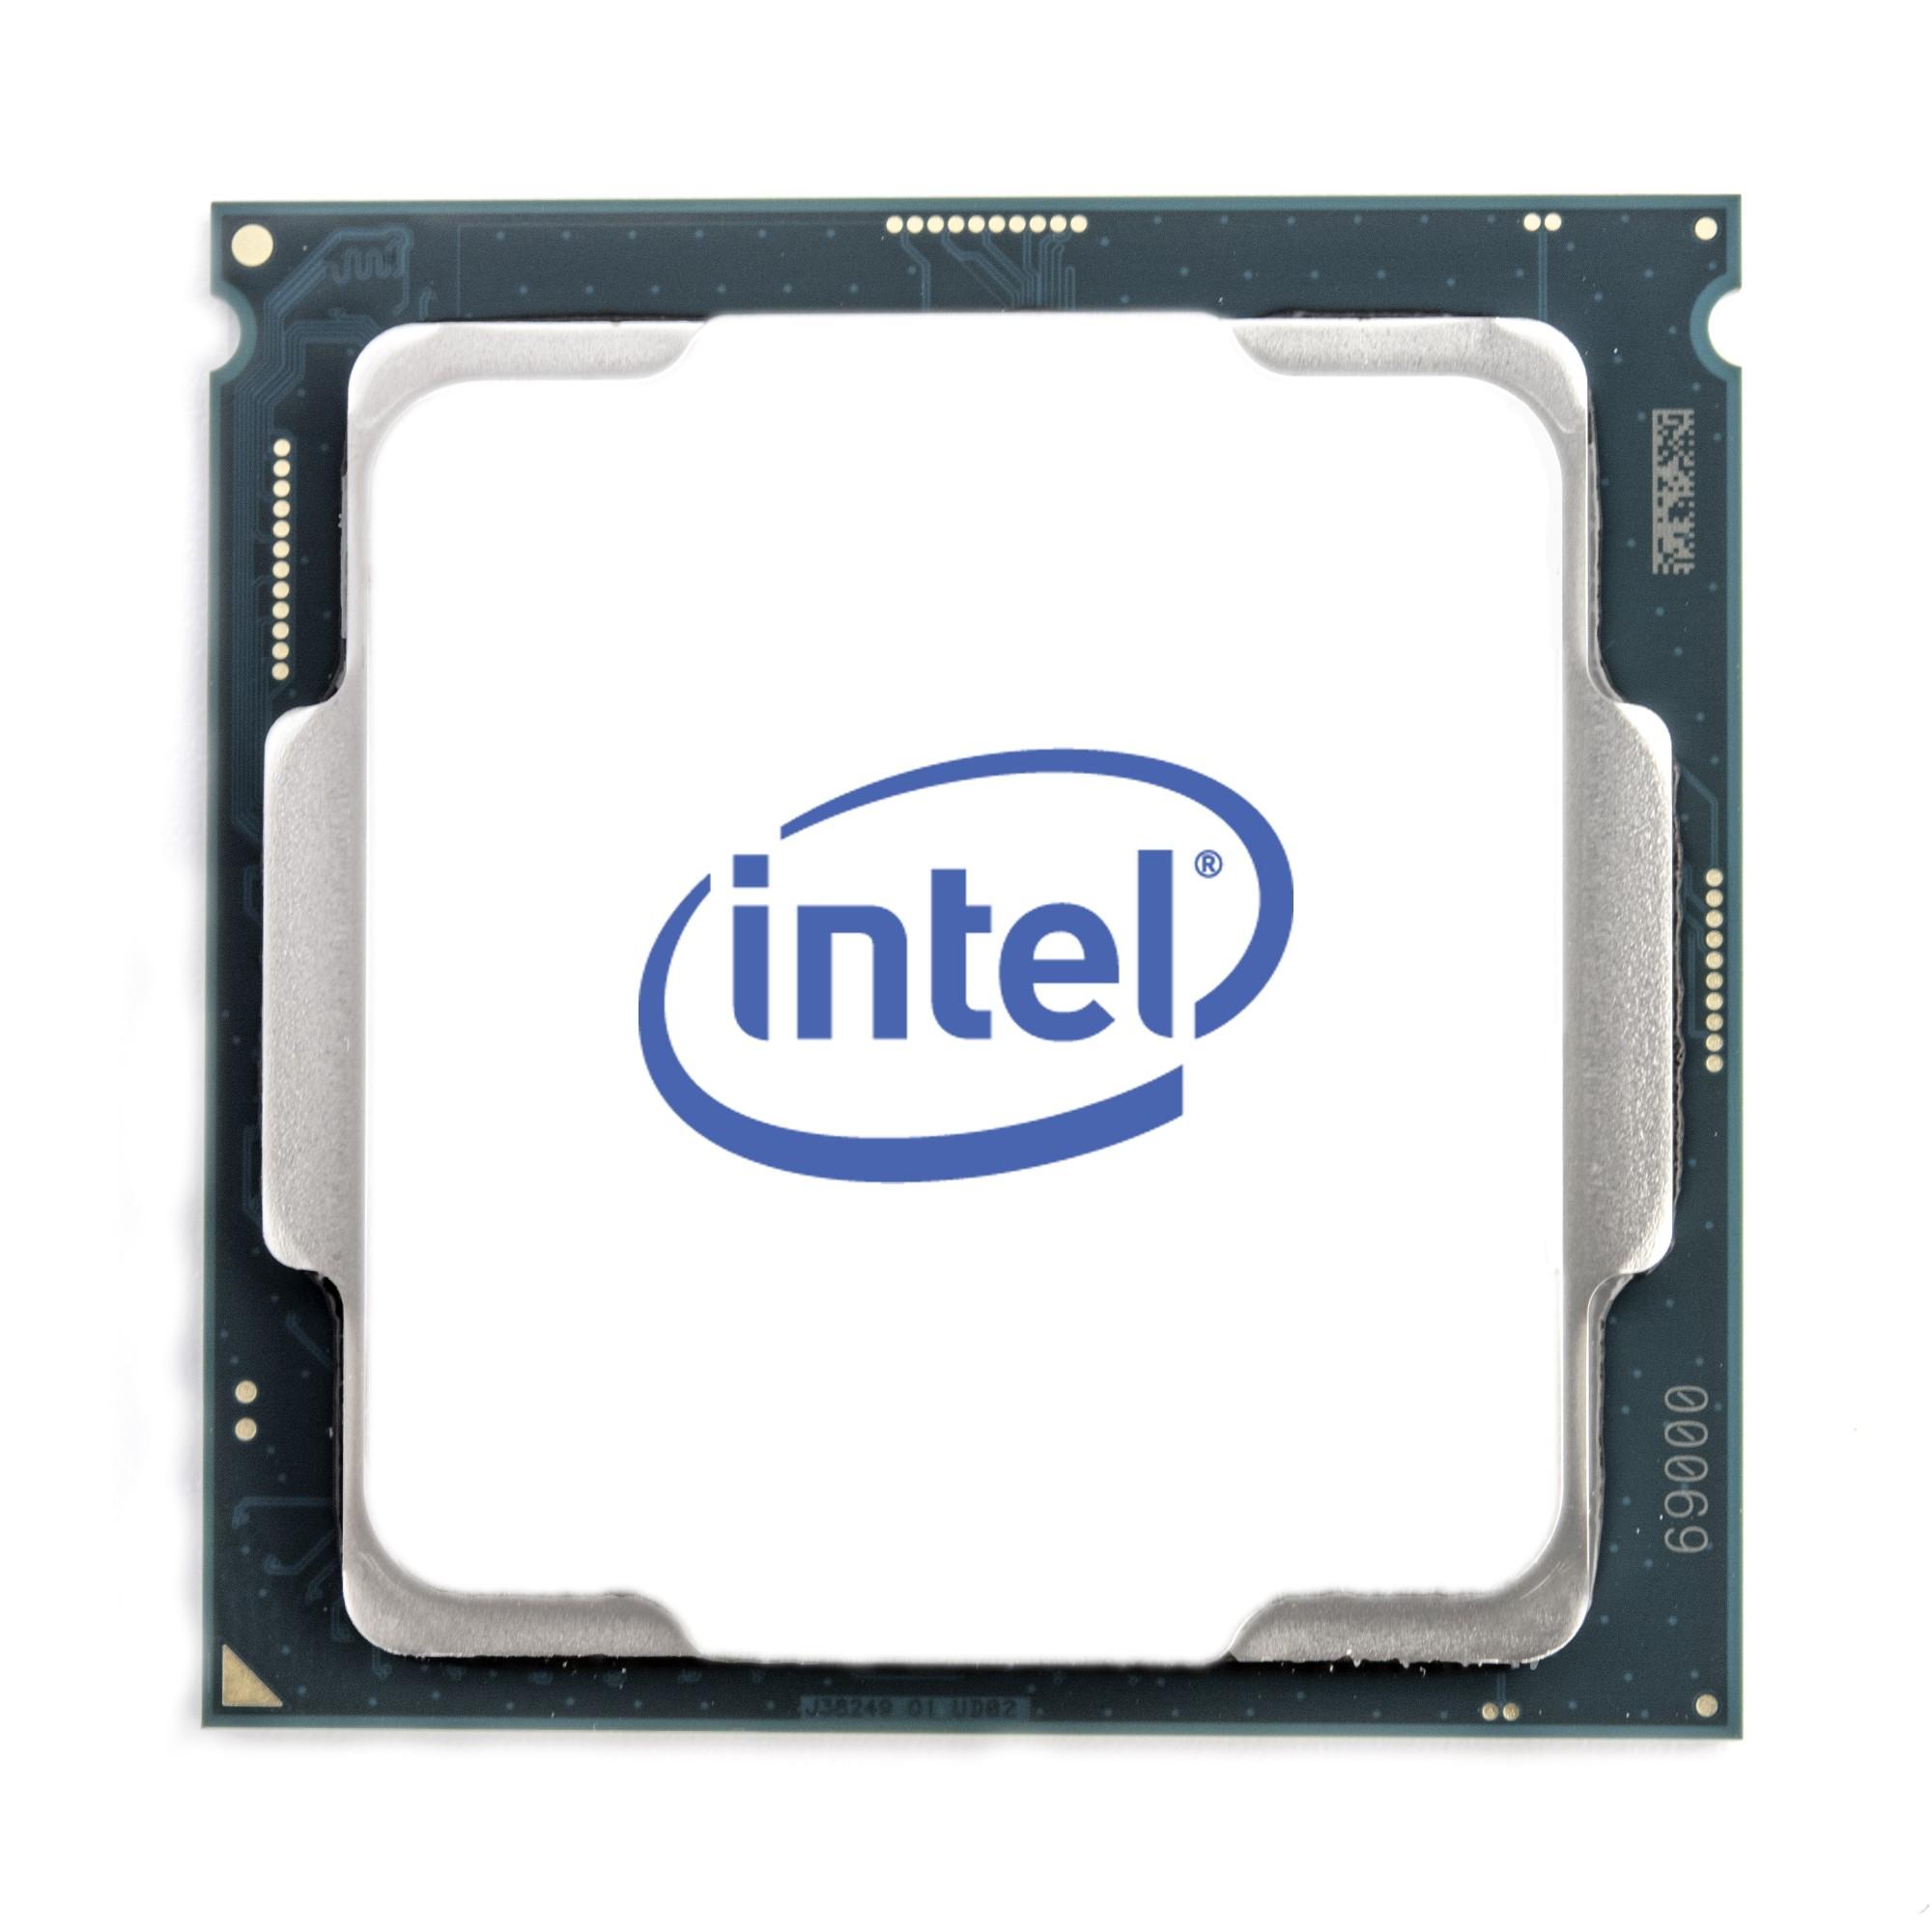 Intel Core i3-8100T processor 3.10 GHz 6 MB Smart Cache